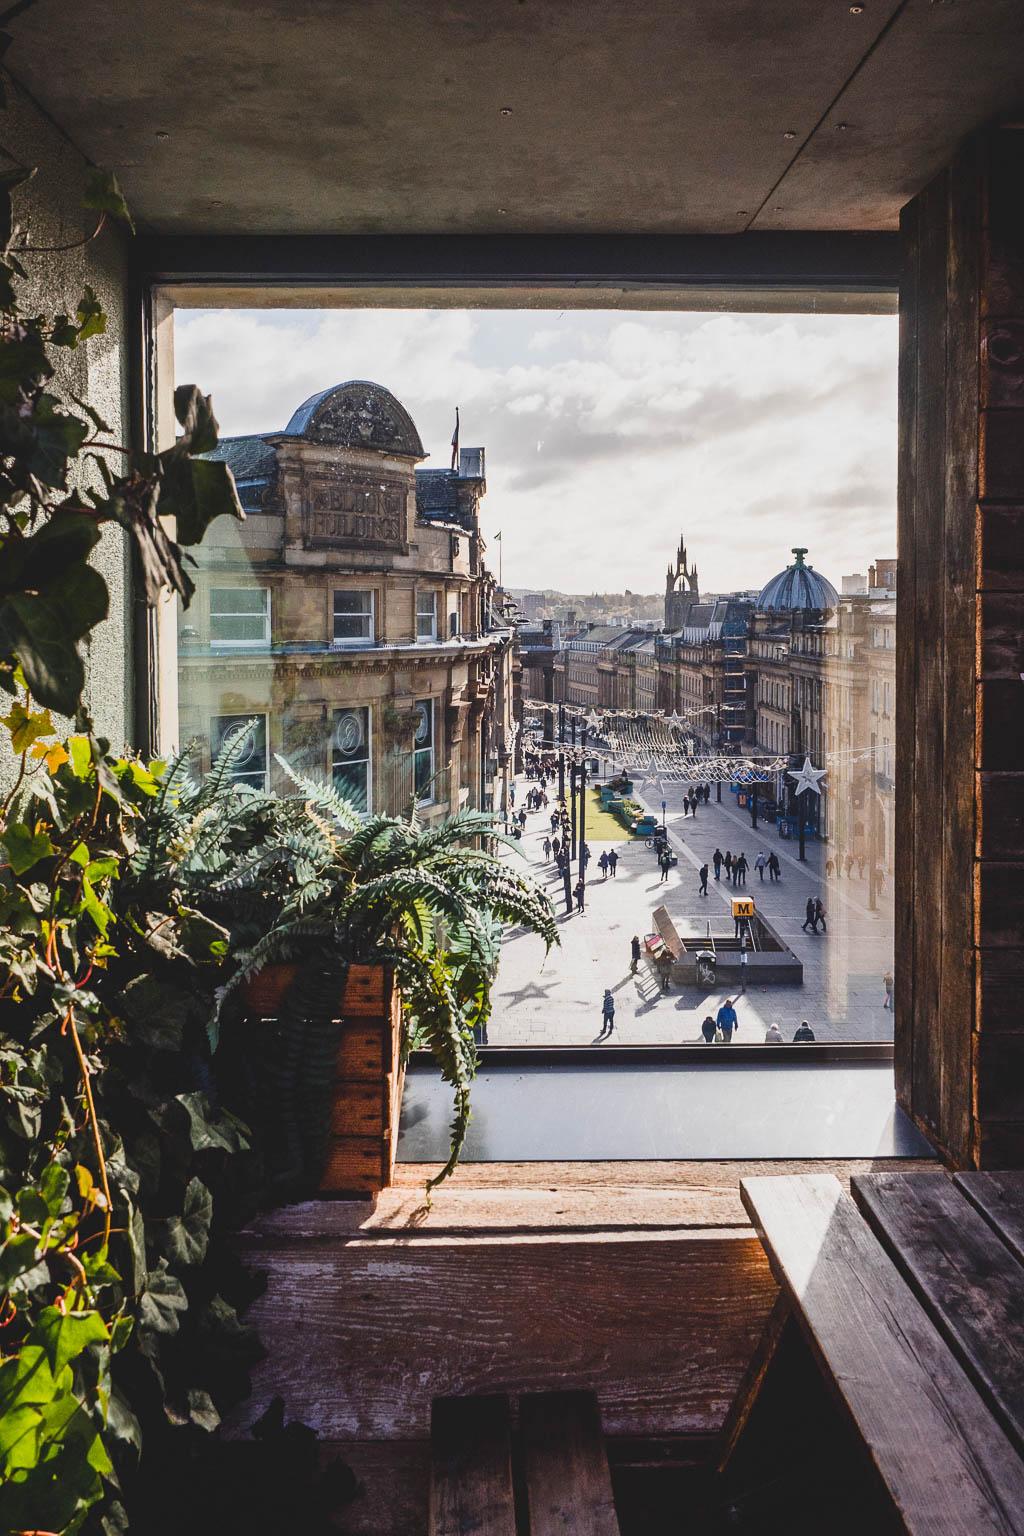 Bar The Botanist Newcastle Blick auf Grey Monument